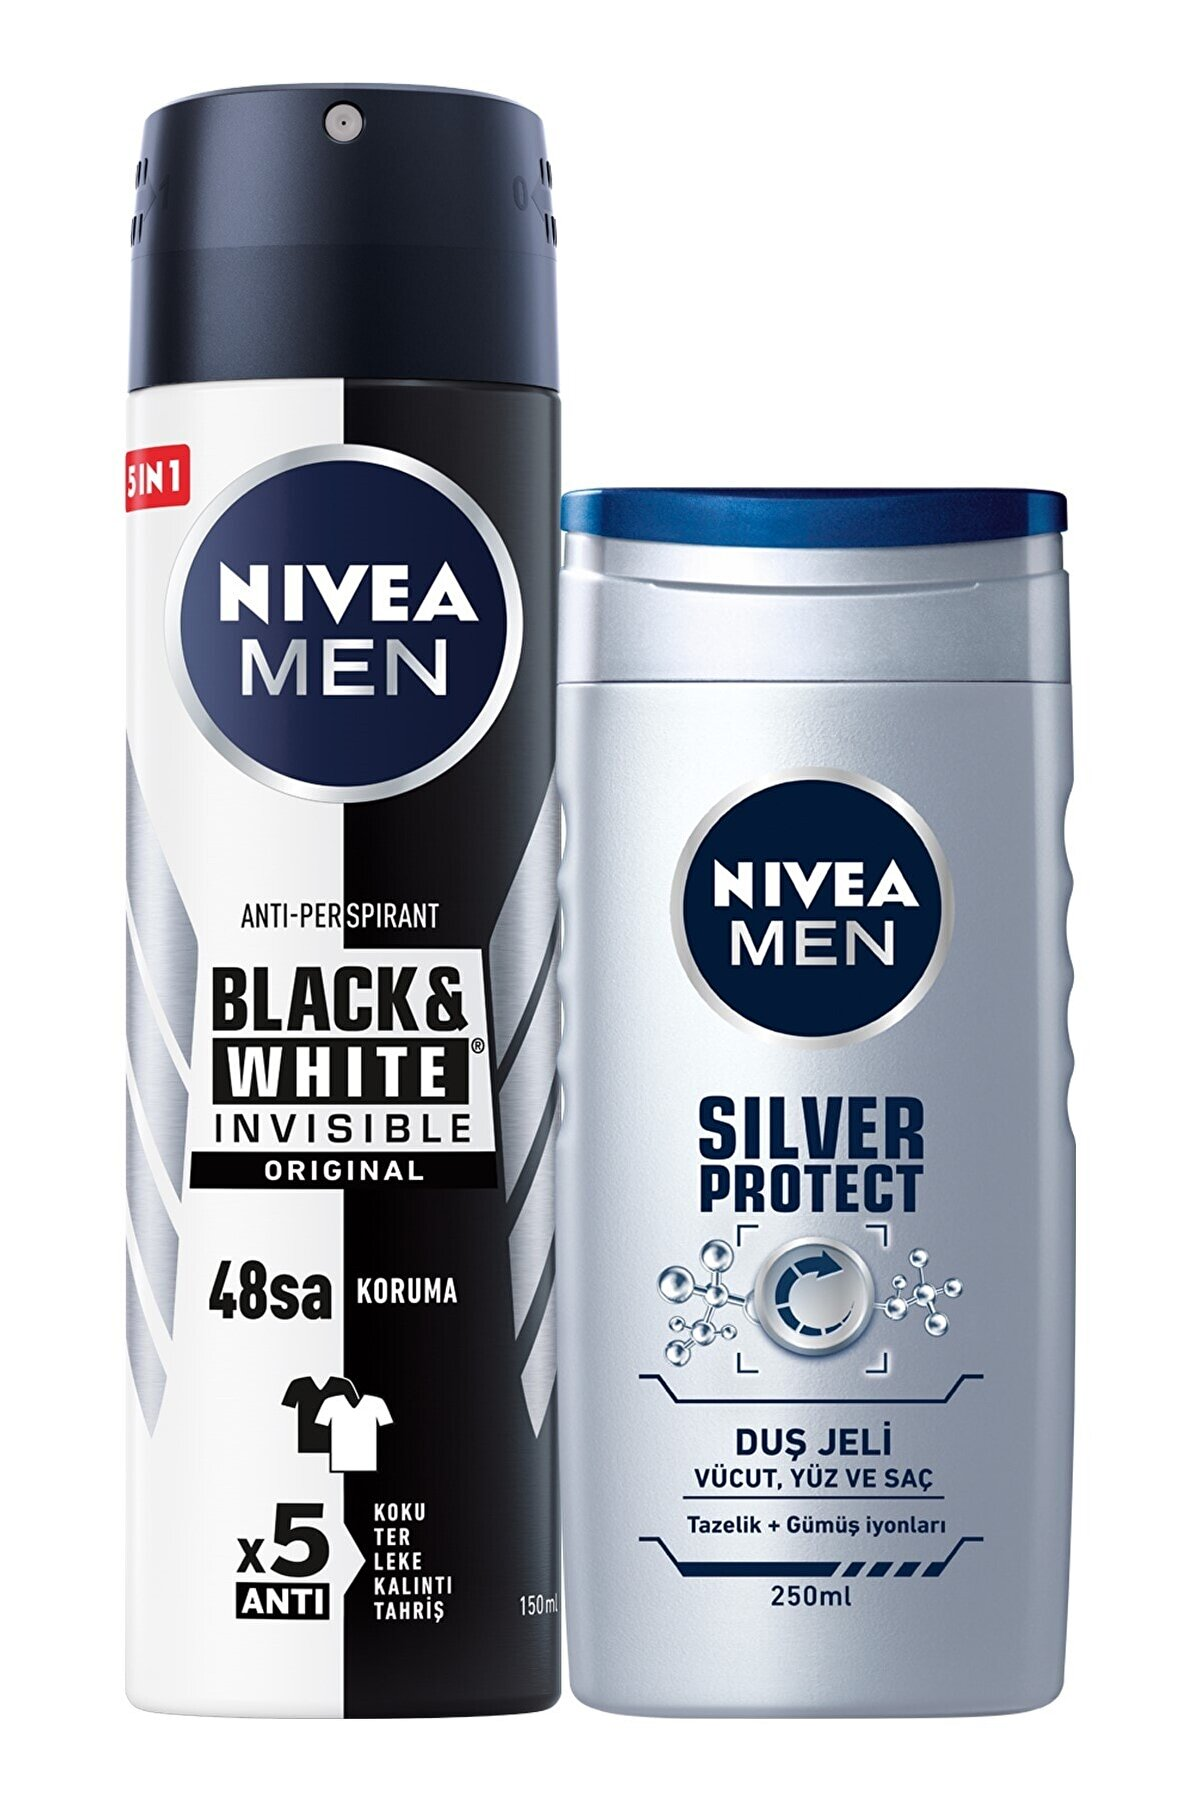 Nivea B&w Original Erkek Sprey Deodorant 150 ml + Silver Protect Erkek Duş Jeli 250 ml